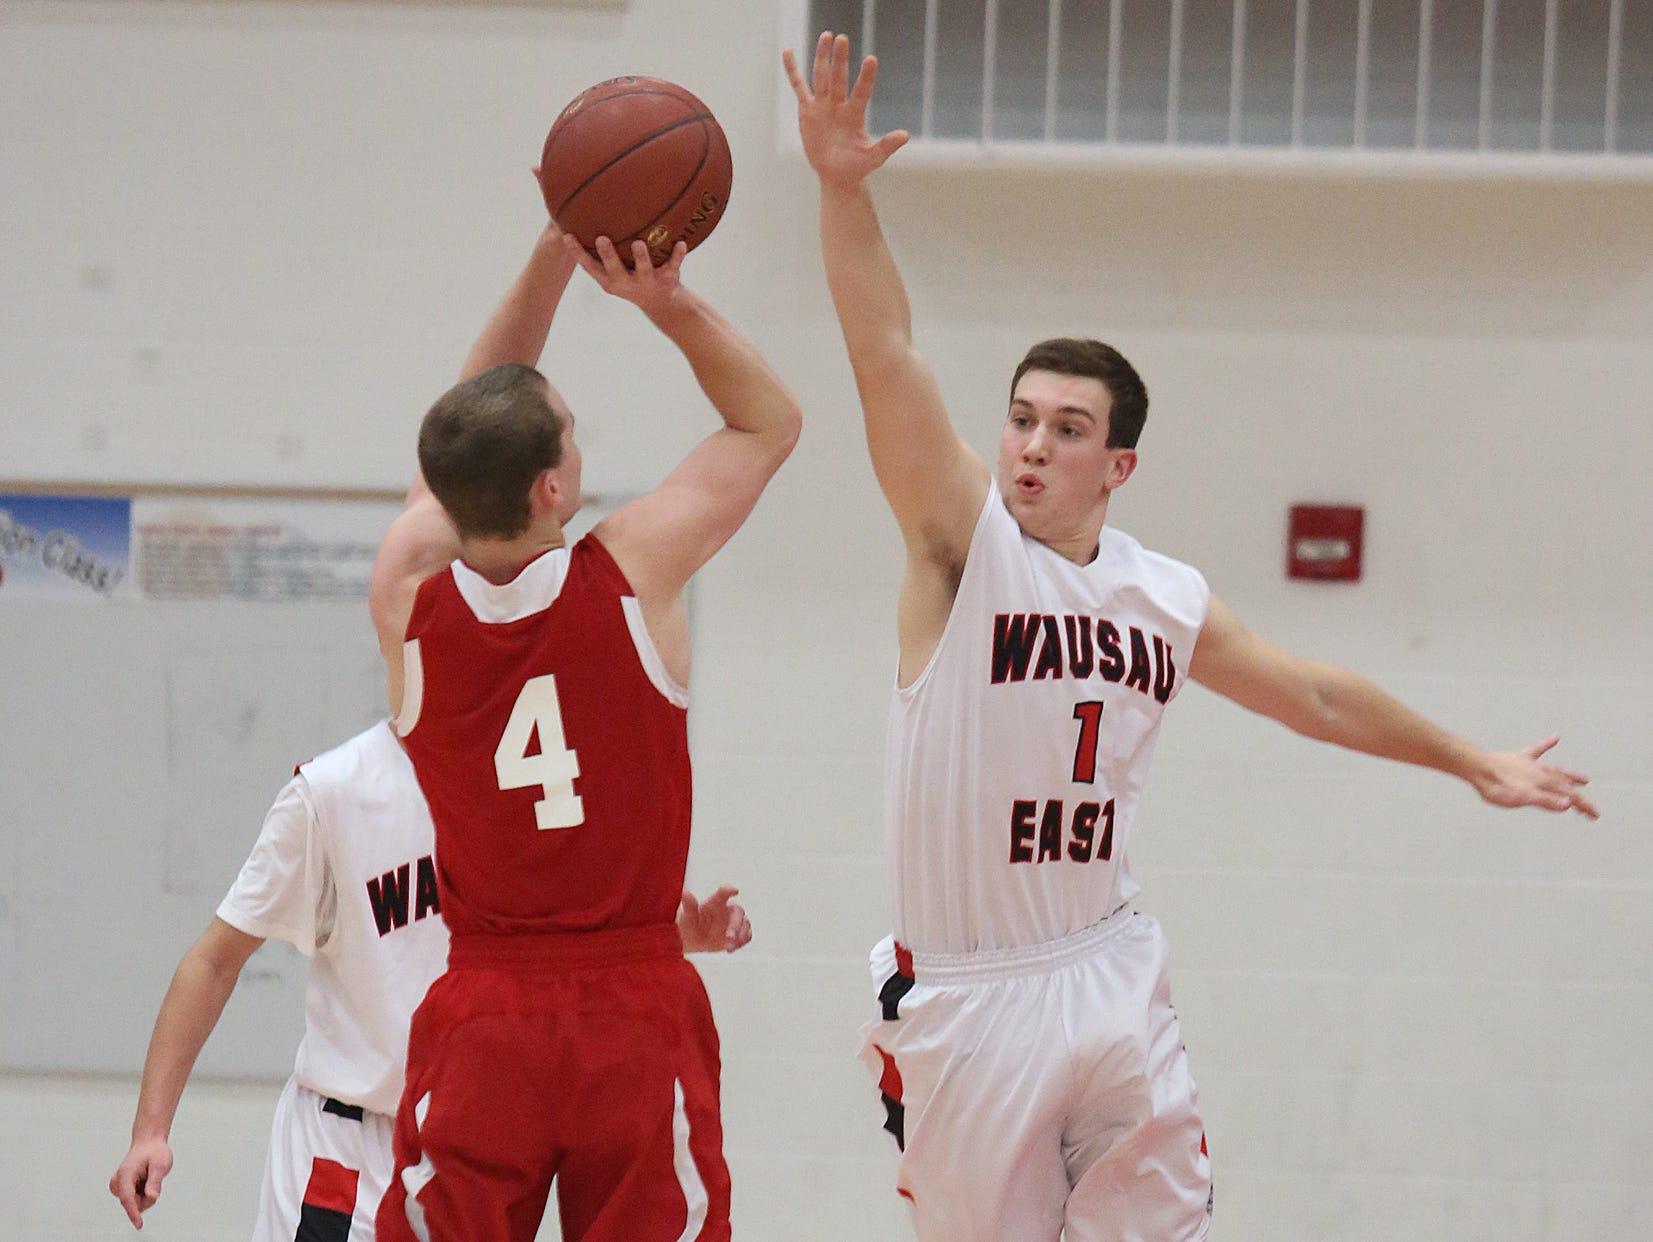 Thomas Dunbar, right, is one of three returning varsity players for the Wausau East boys basketball team this season.